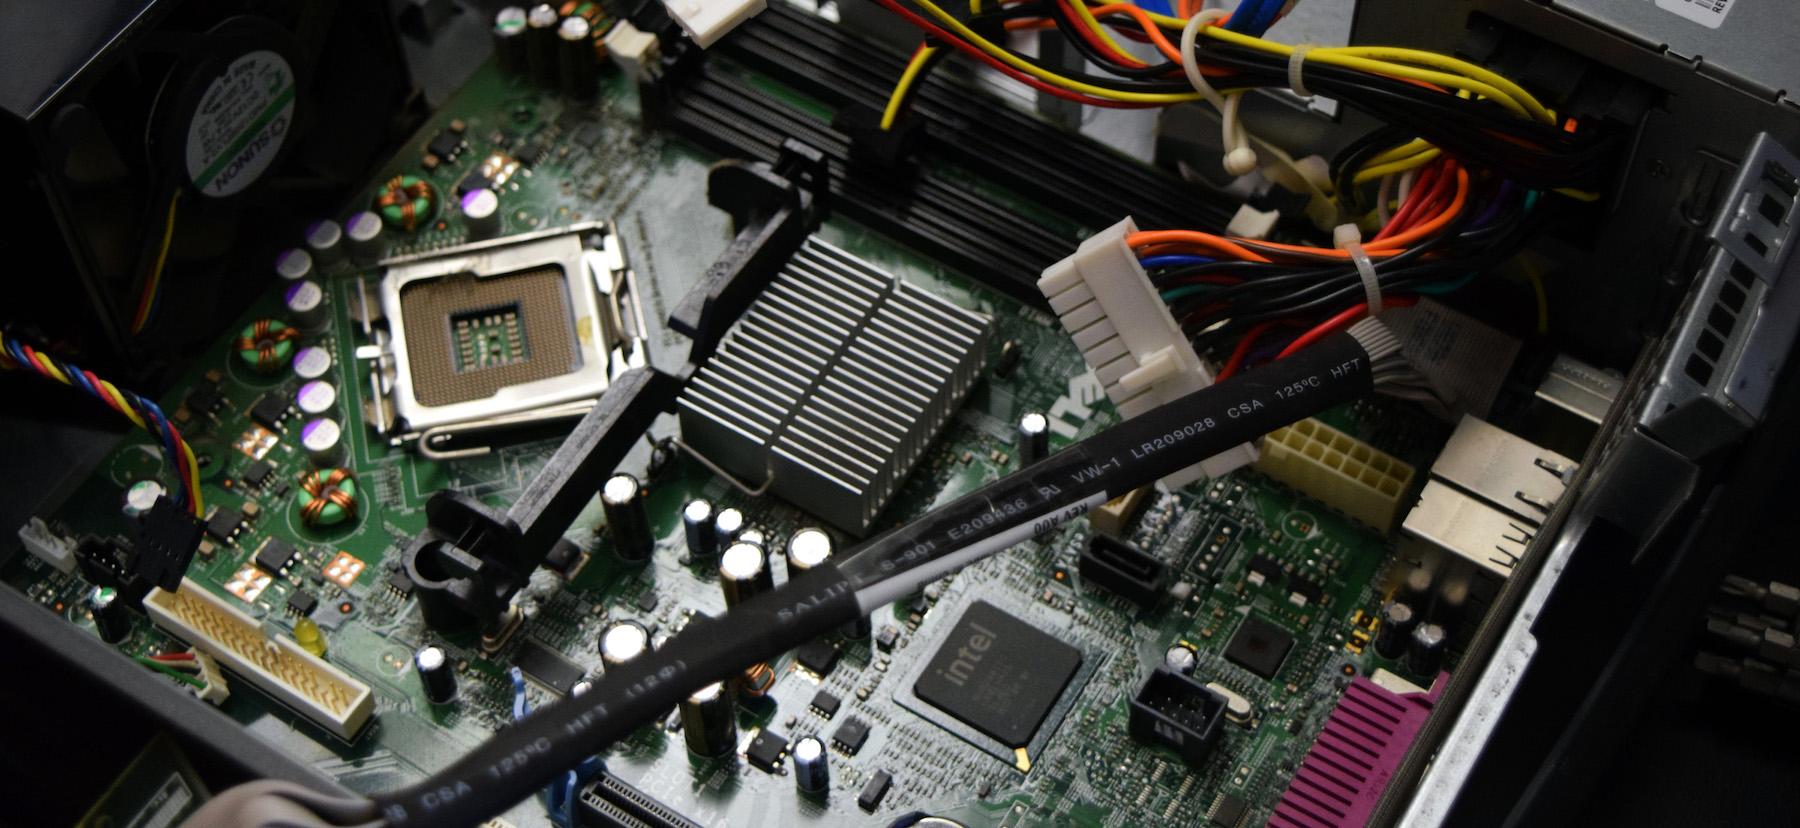 A dismantled computer